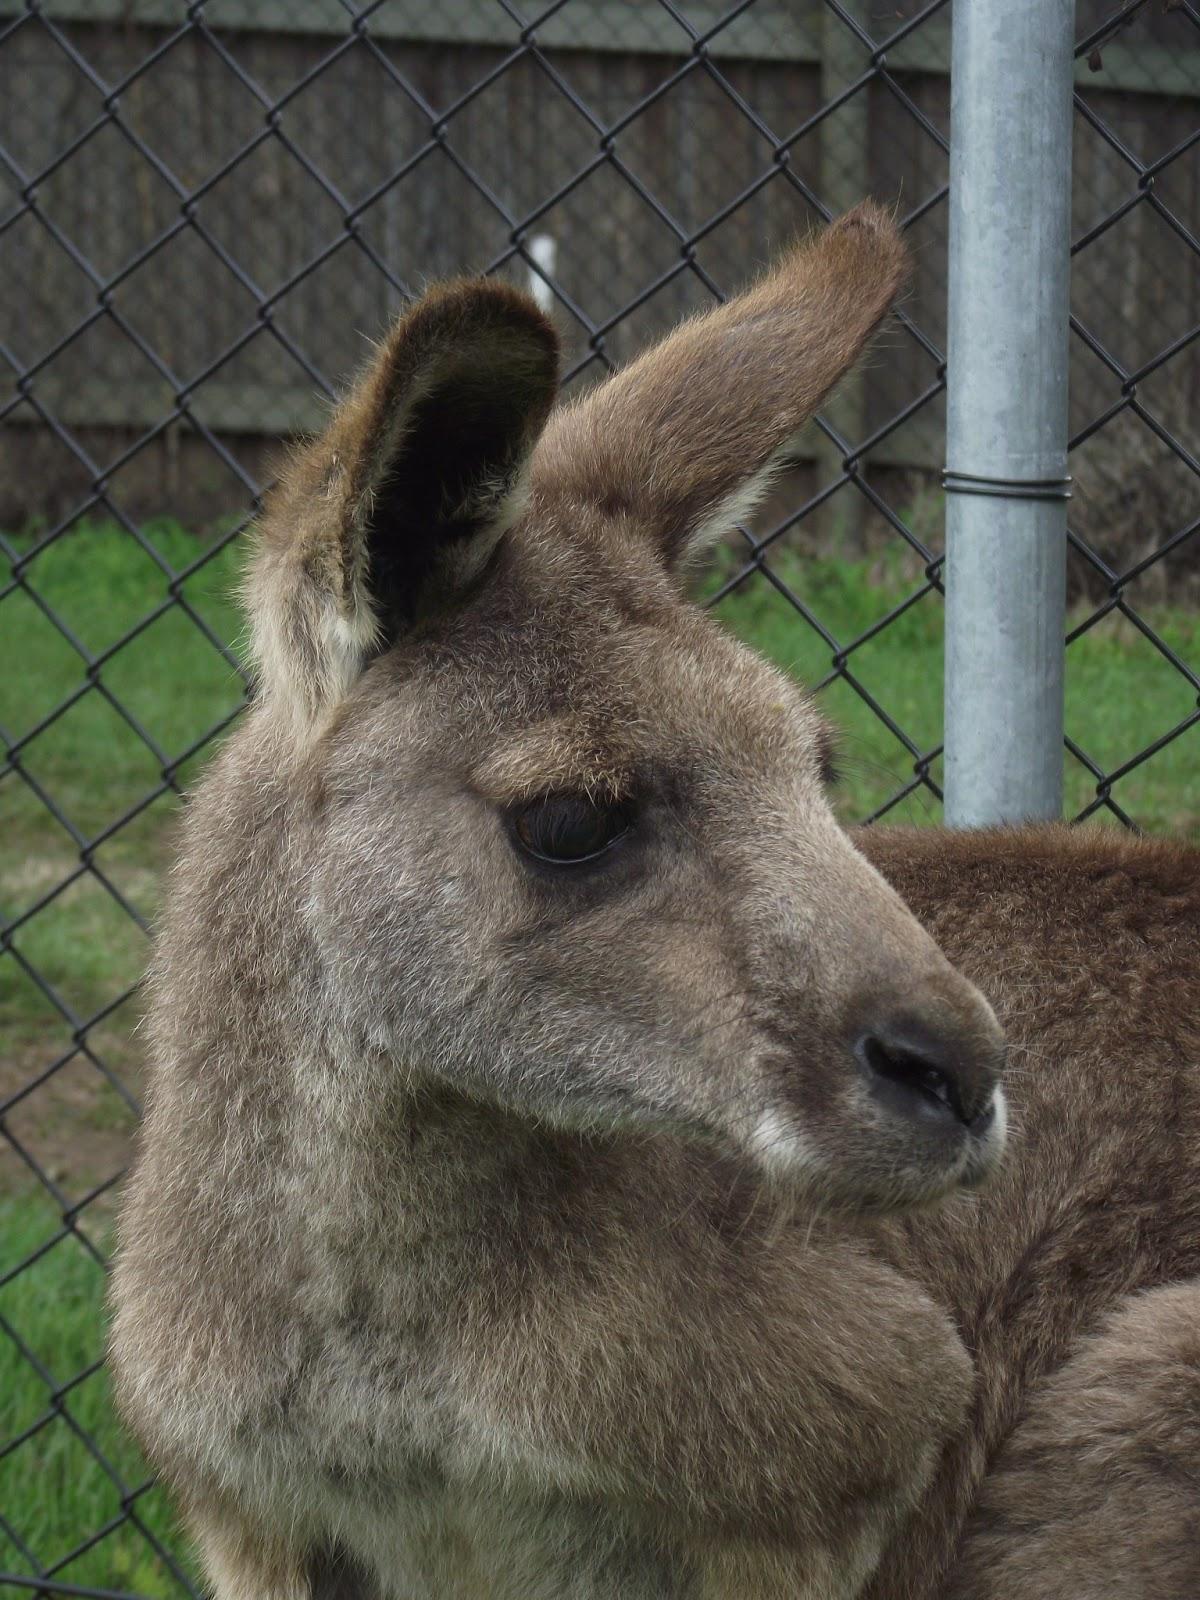 Meine Abenteuer In Australien Brisbane Lone Pine Koala